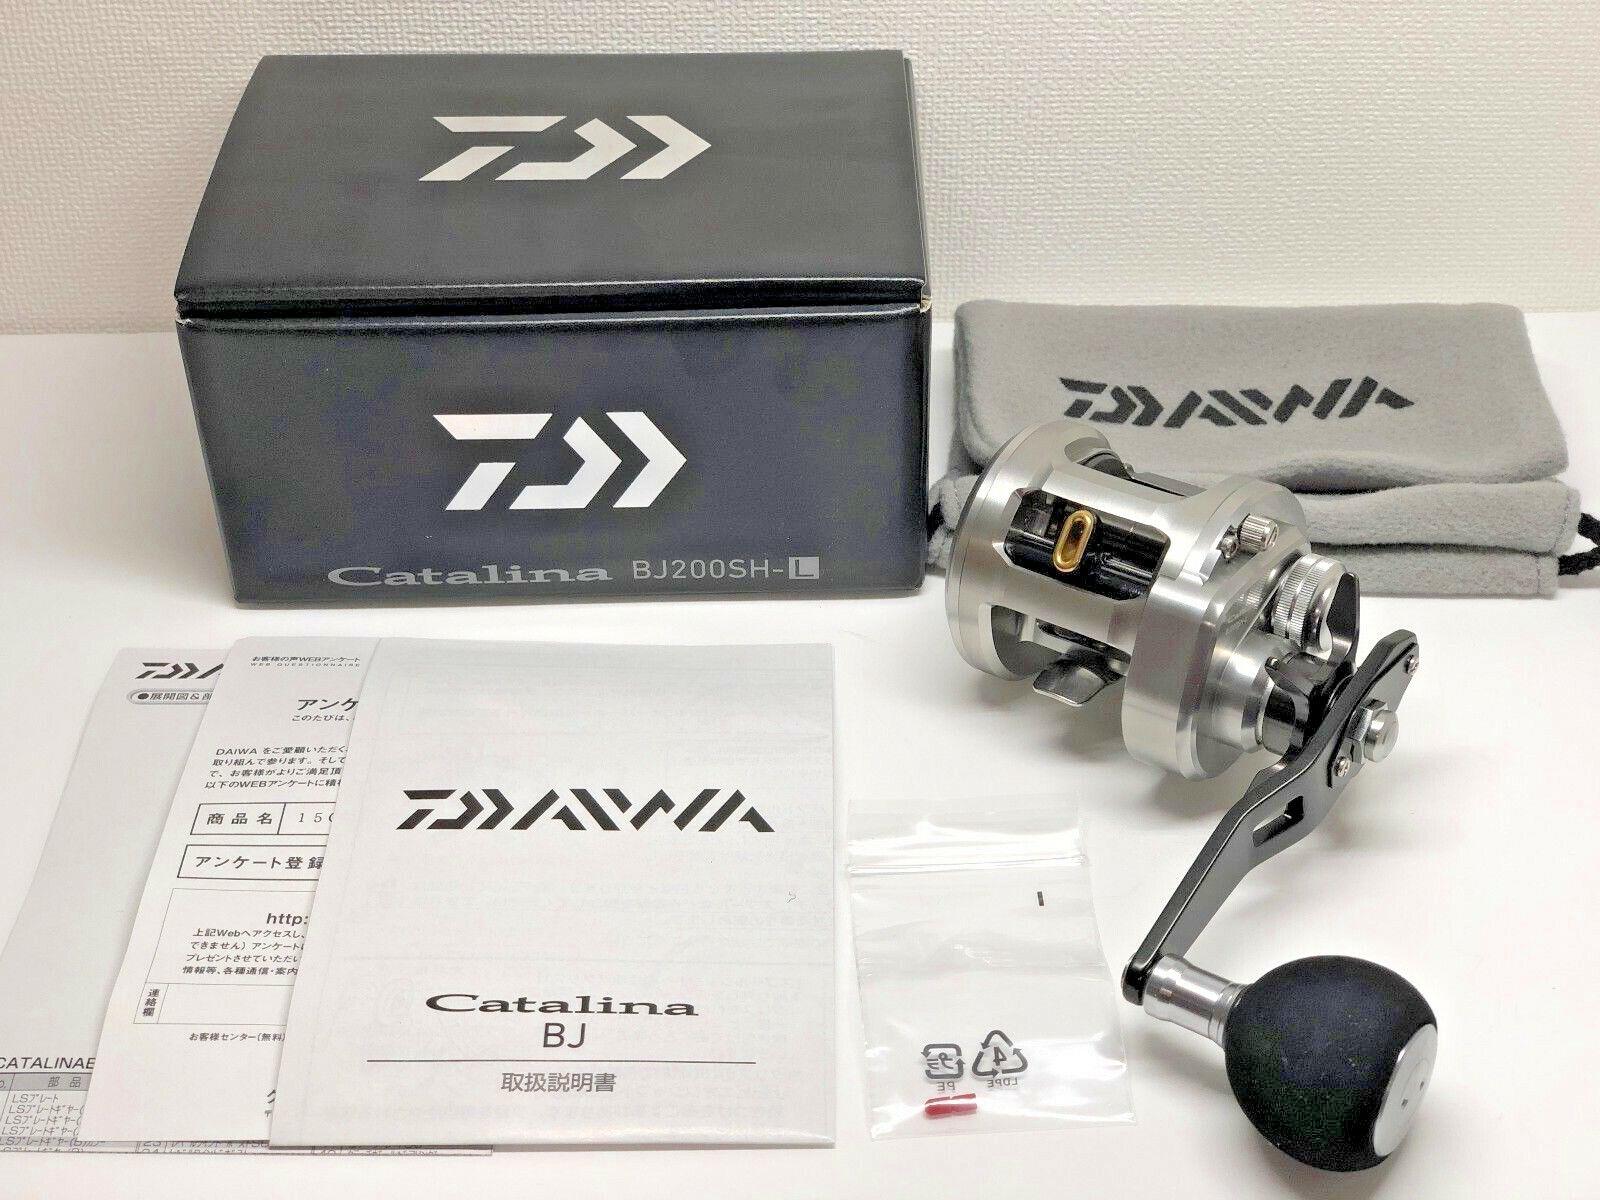 DAIWA 15 CATALINA BJ 200SHL  from Japan